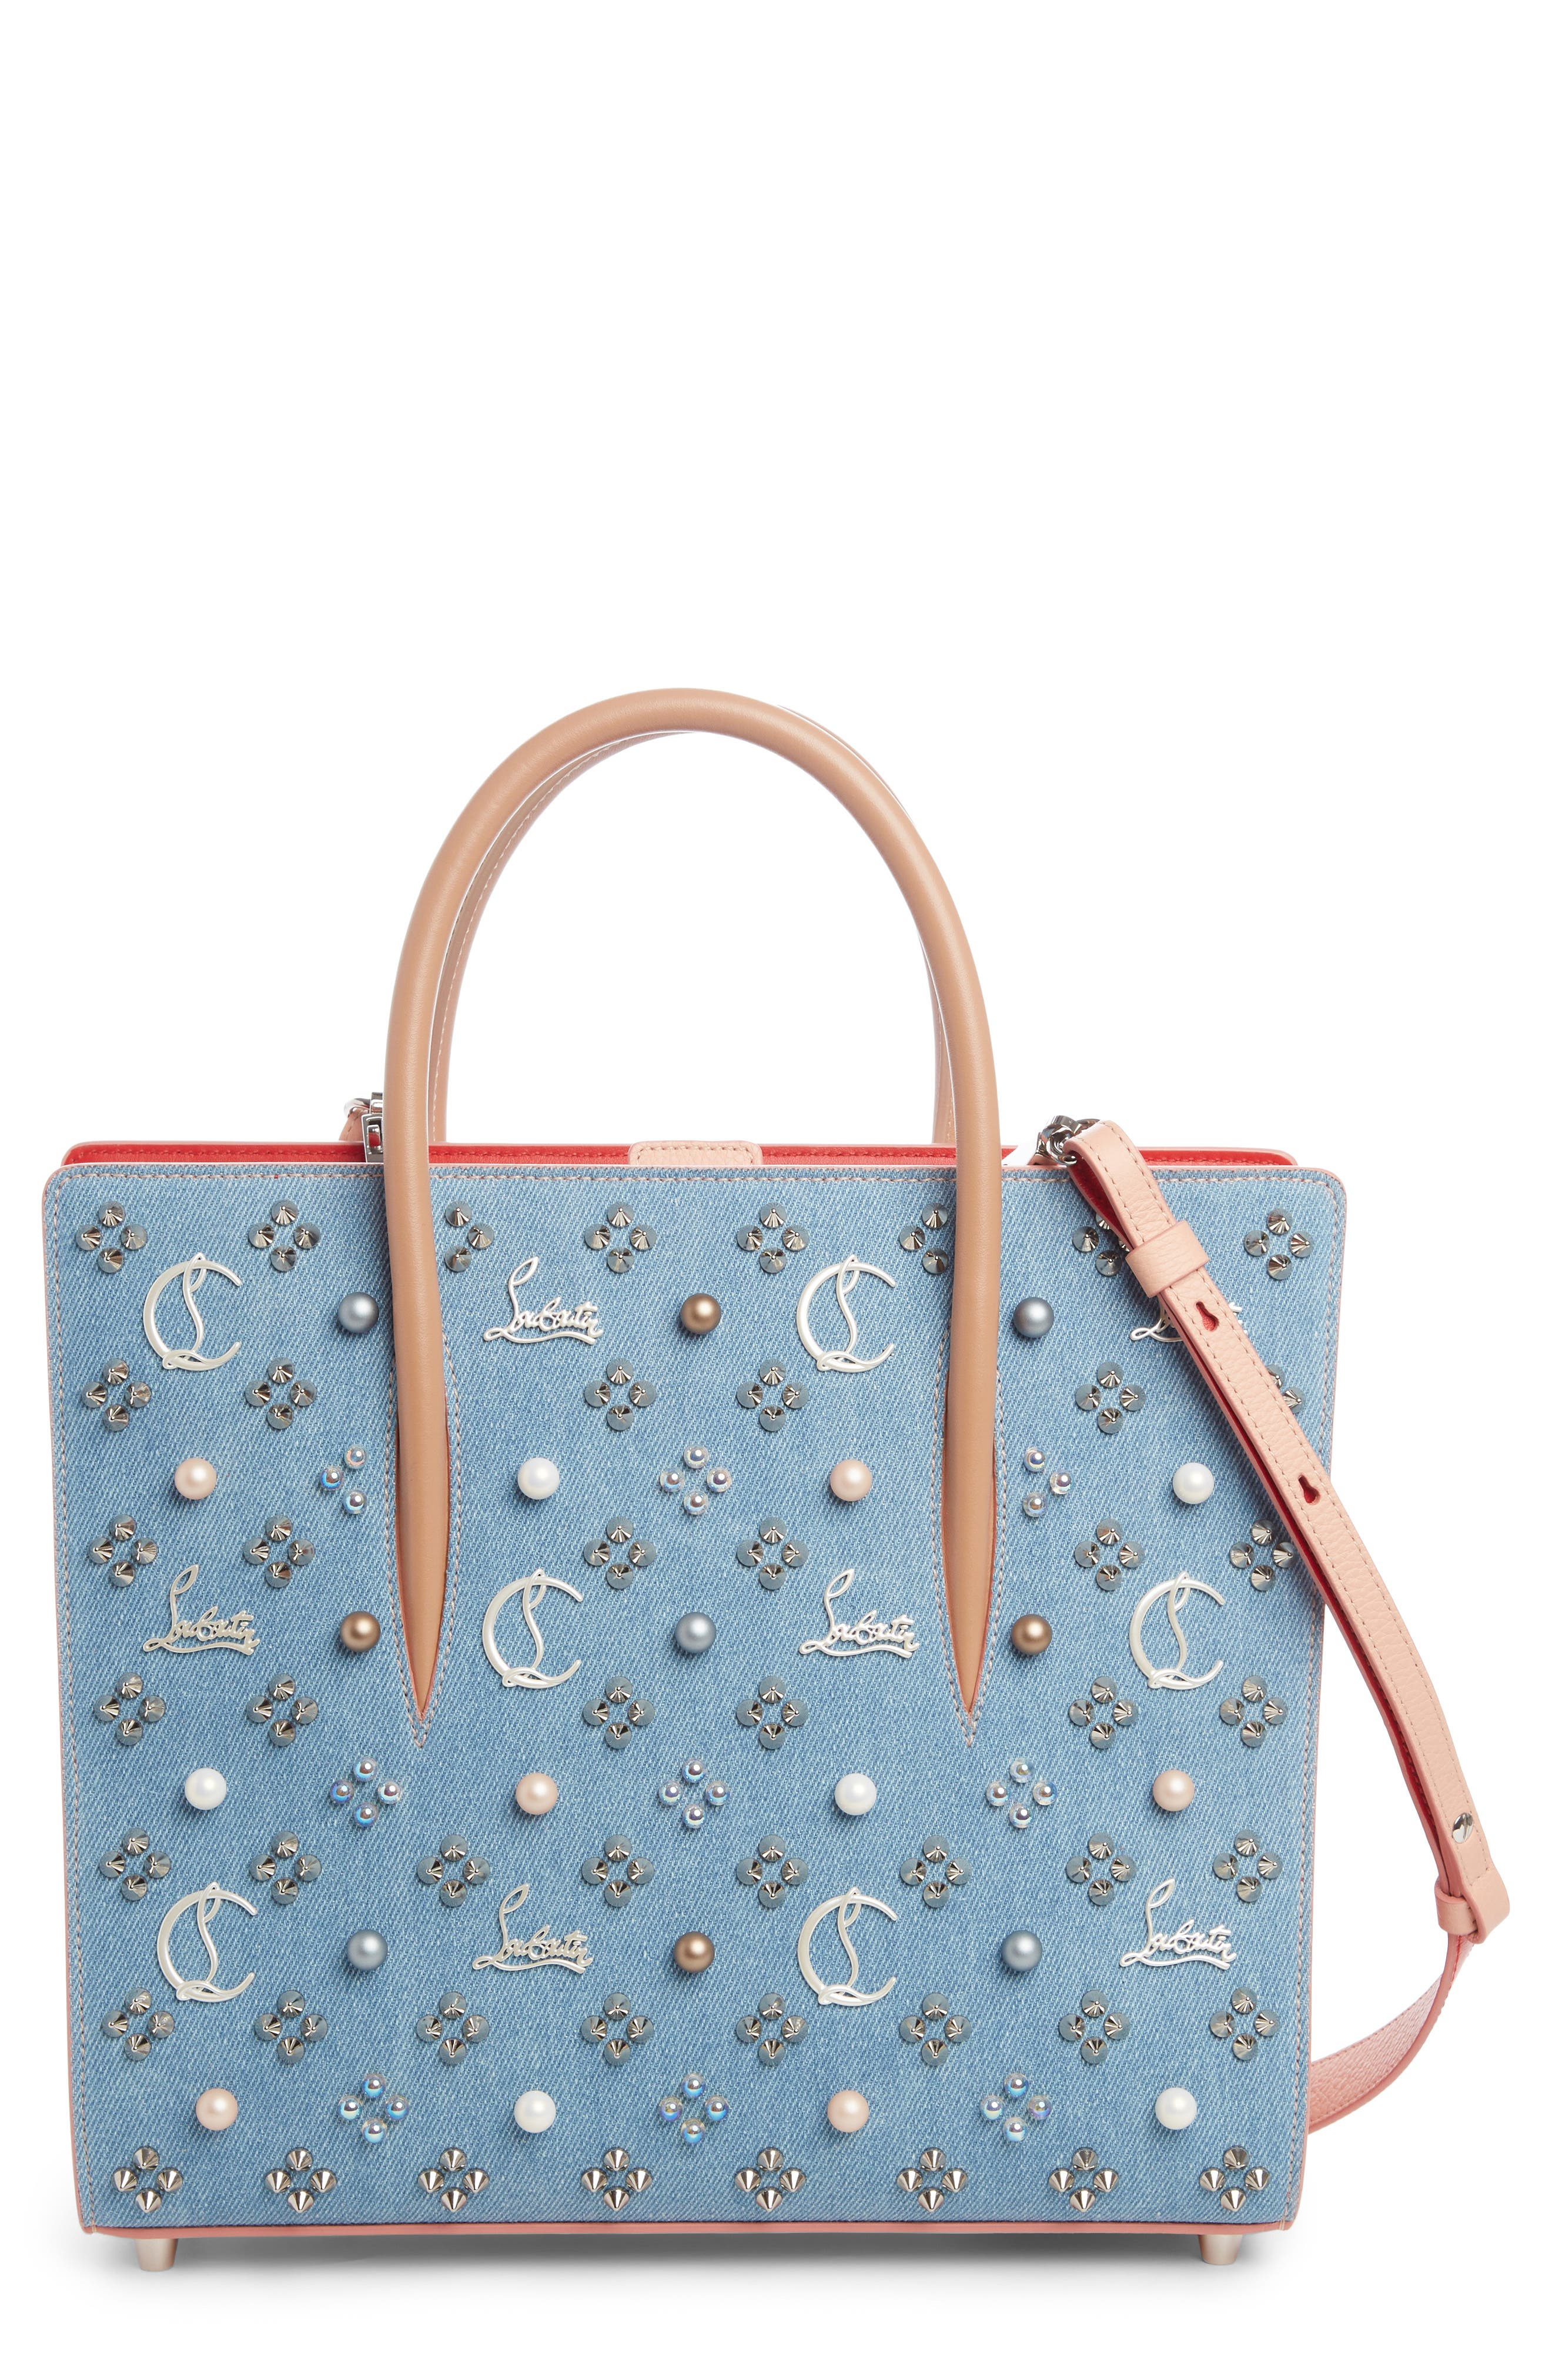 Medium Paloma Studded Denim & Leather Tote,                         Main,                         color, Blue/ Pearl Mix